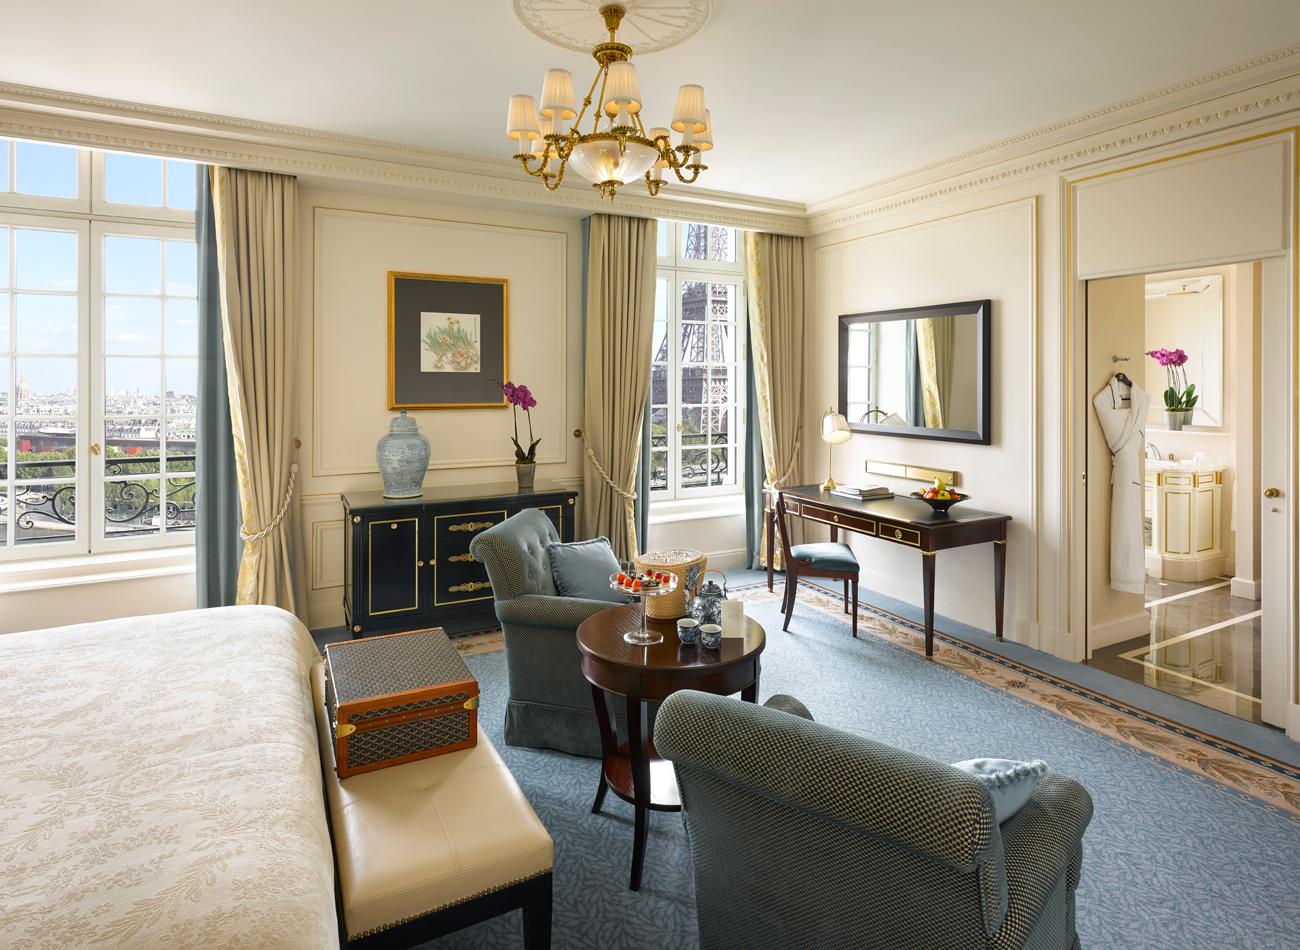 Shangri-La Paris: 3rd Night Free + Shangri-La Luxury Circle Benefits